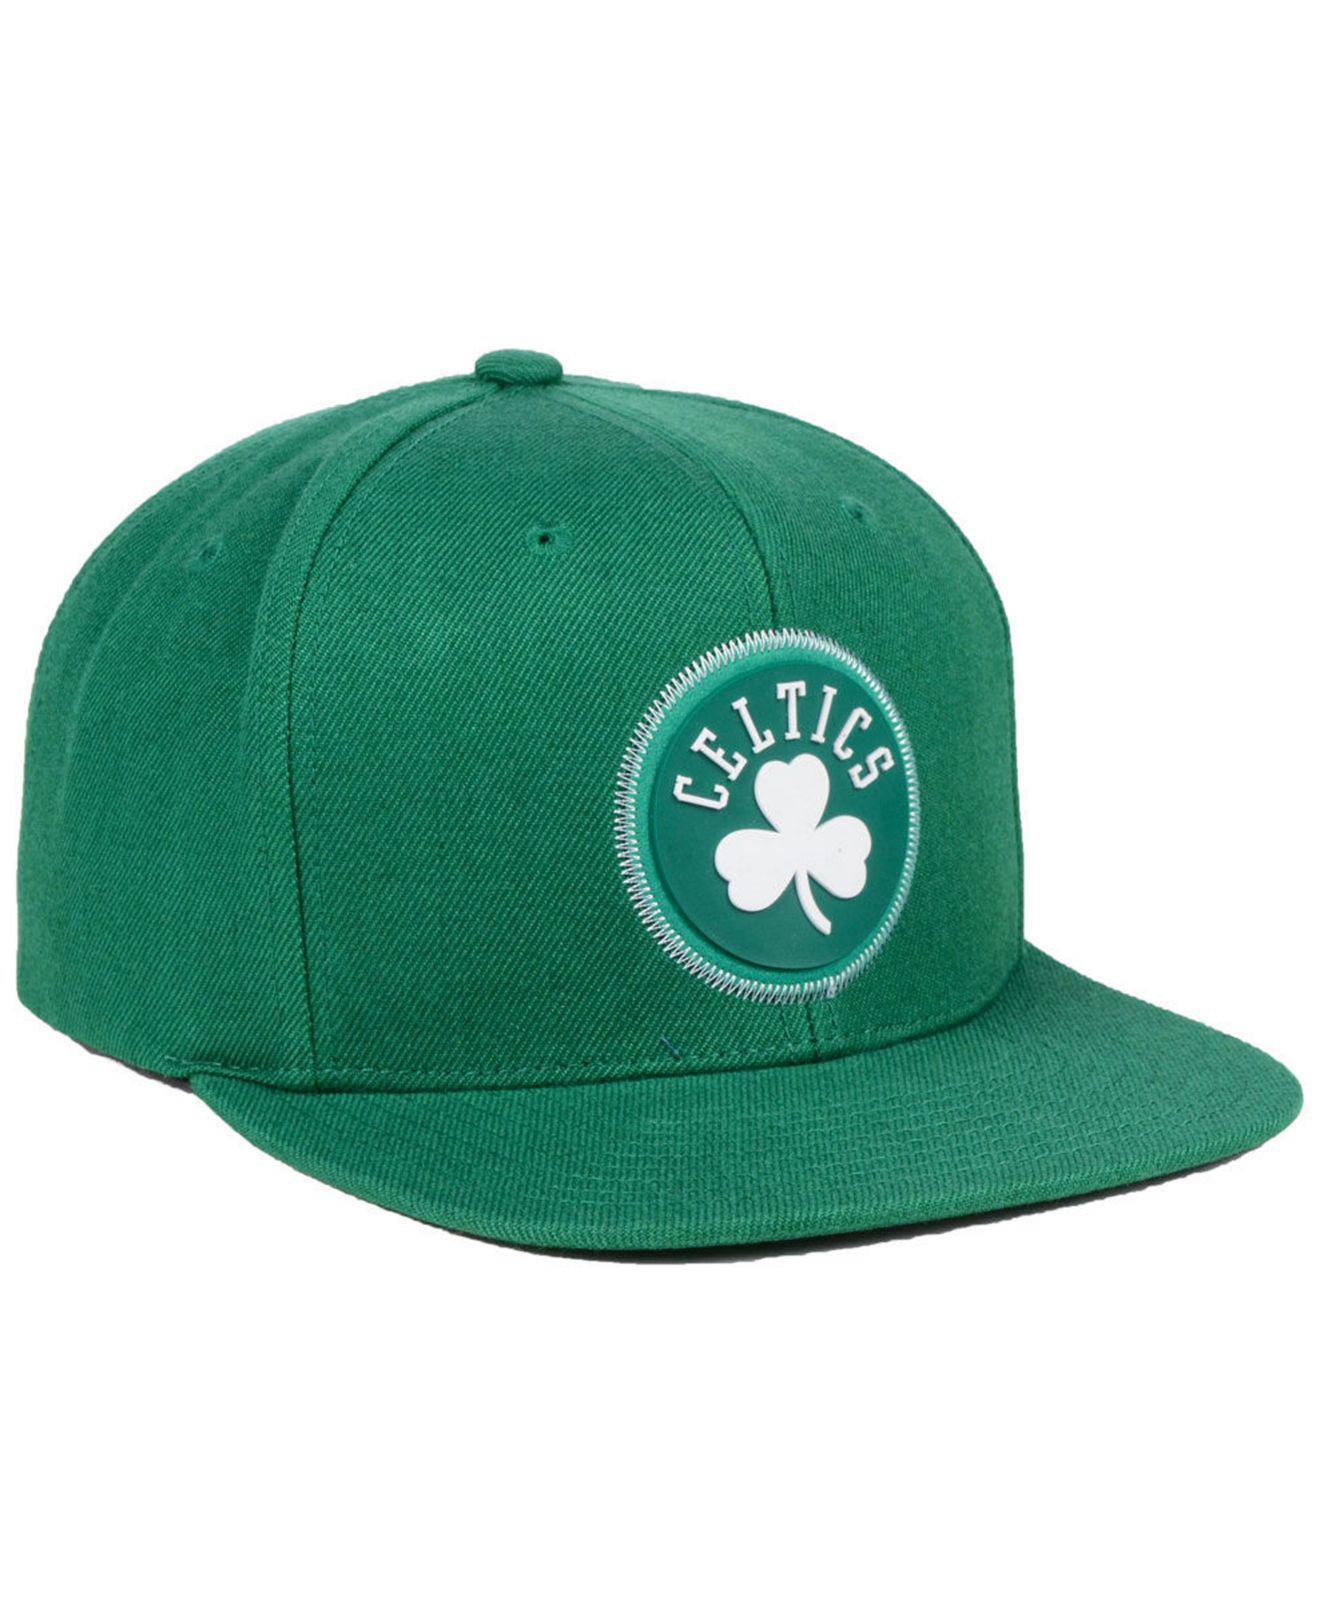 sale retailer 522dd ff39d ... inexpensive mitchell ness green boston celtics zig zag snapback cap for men  lyst. view fullscreen